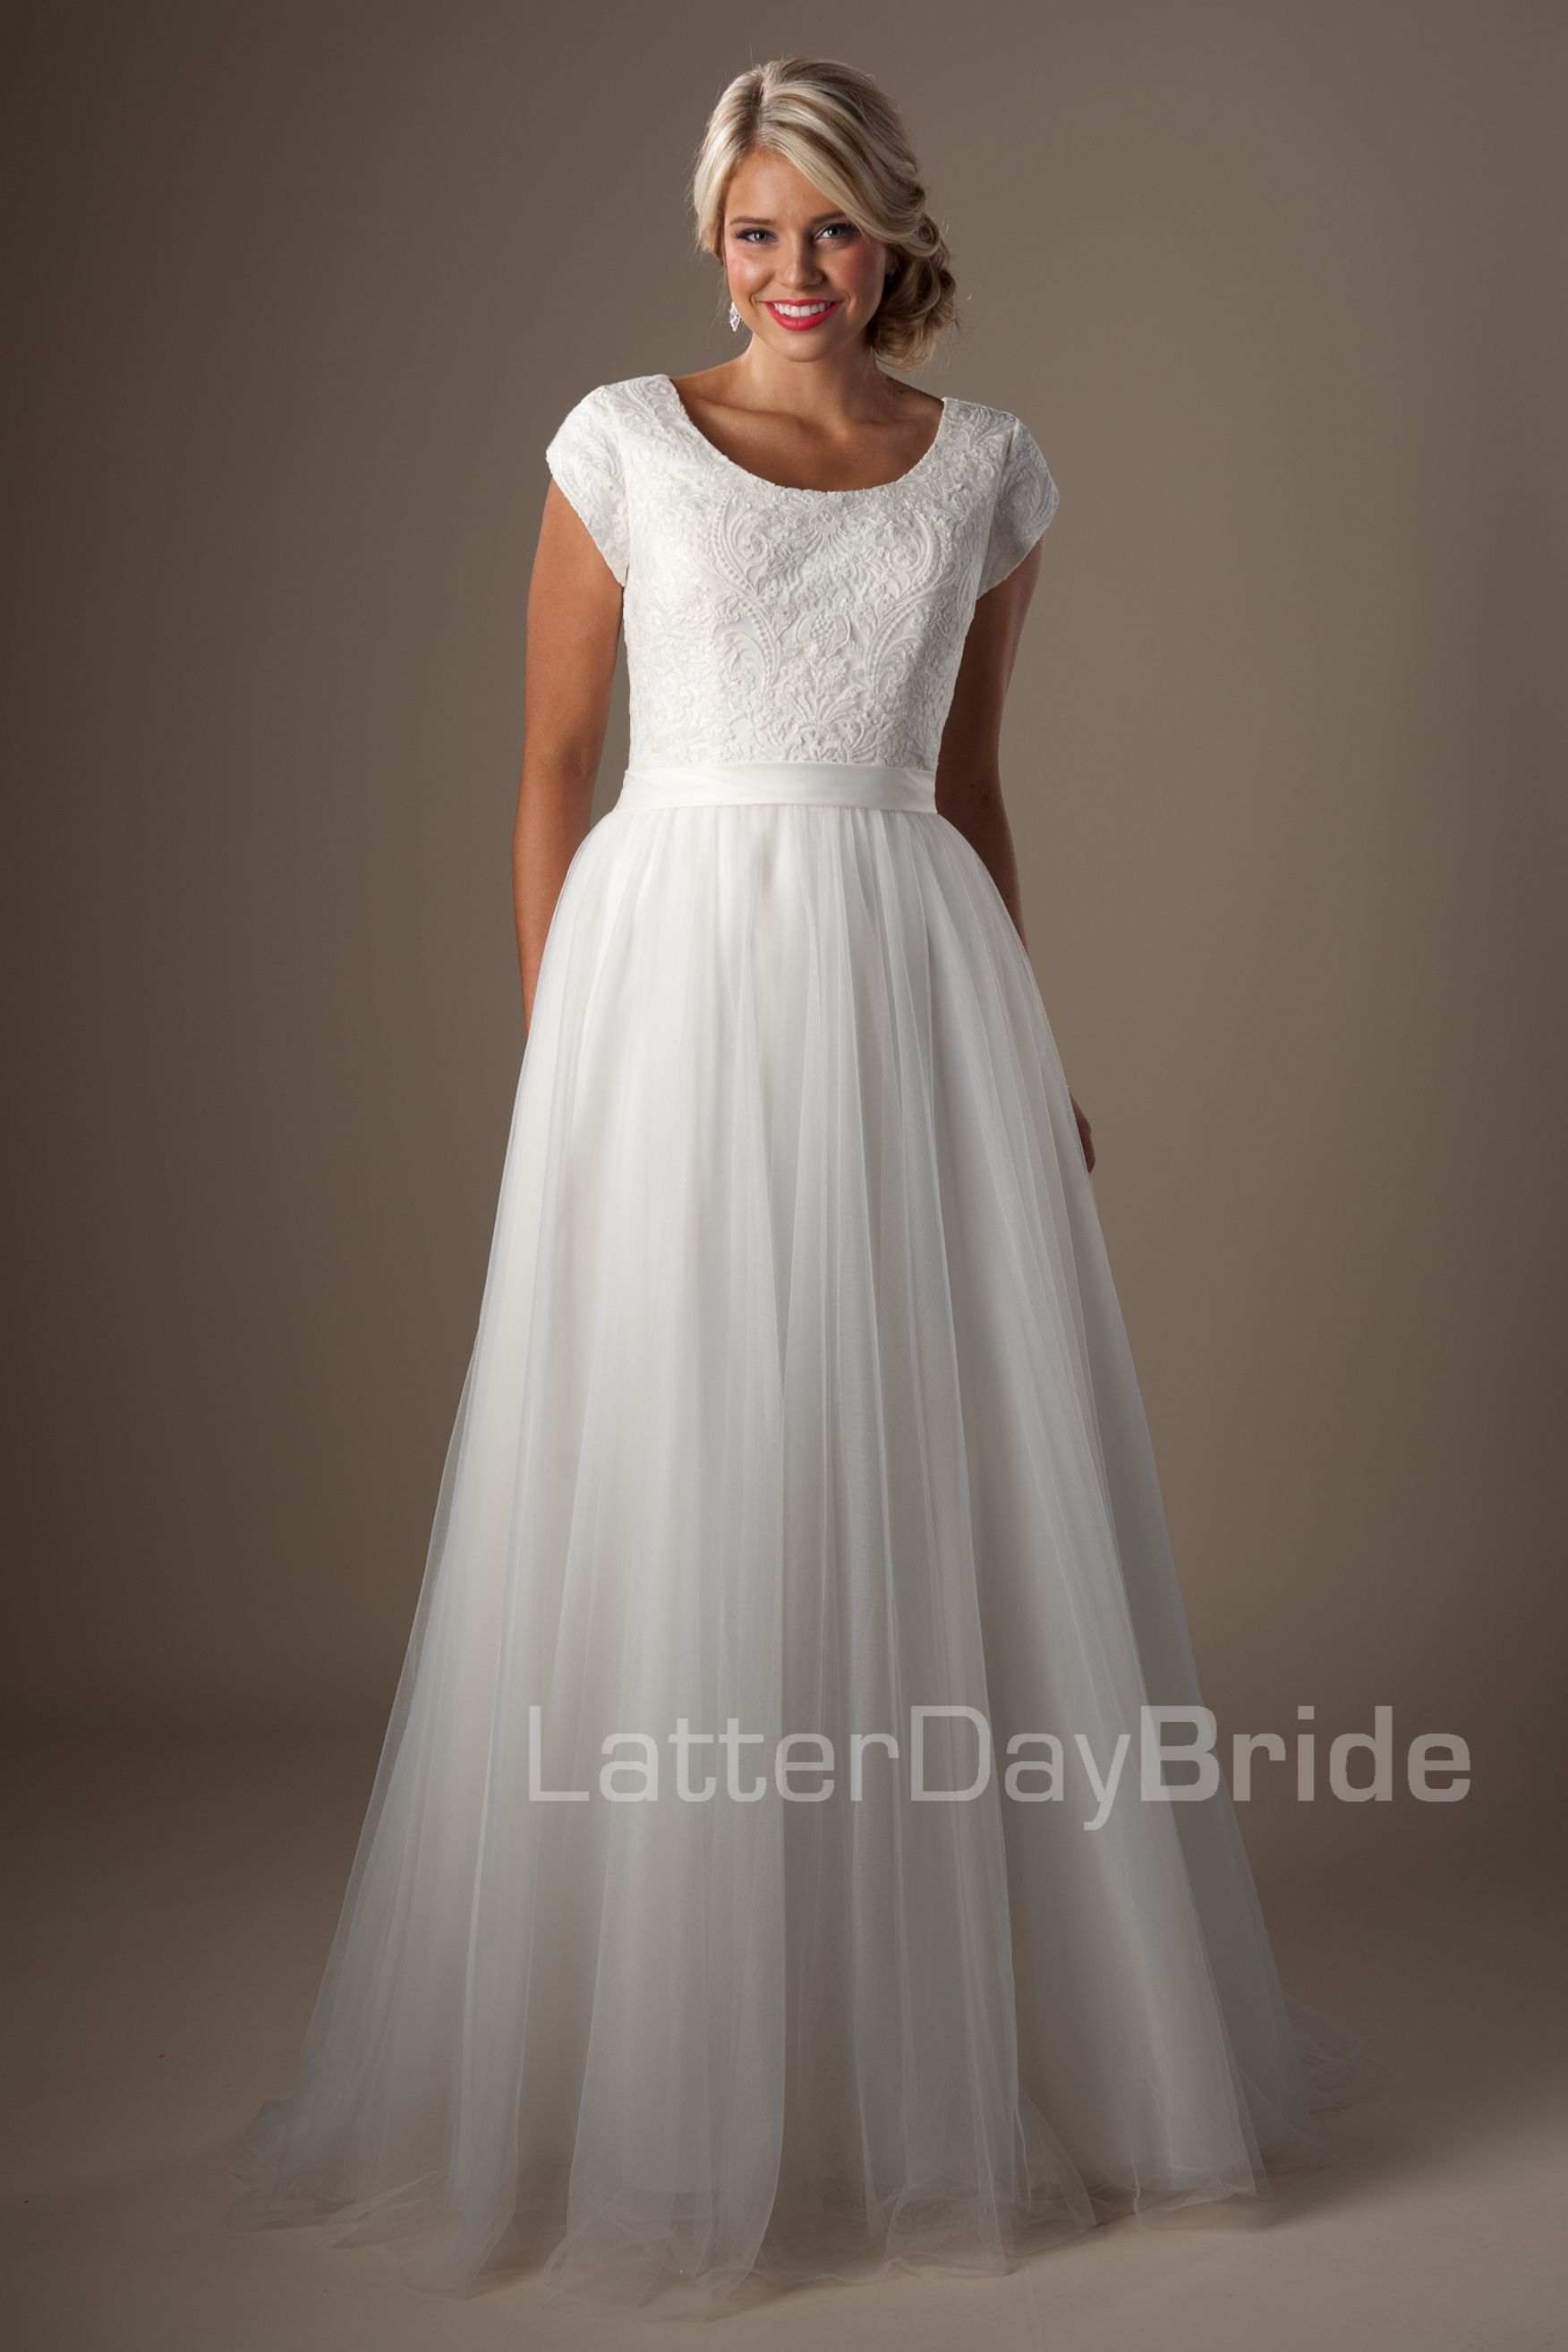 Modest wedding dresses roslyn wedding wish board pinterest